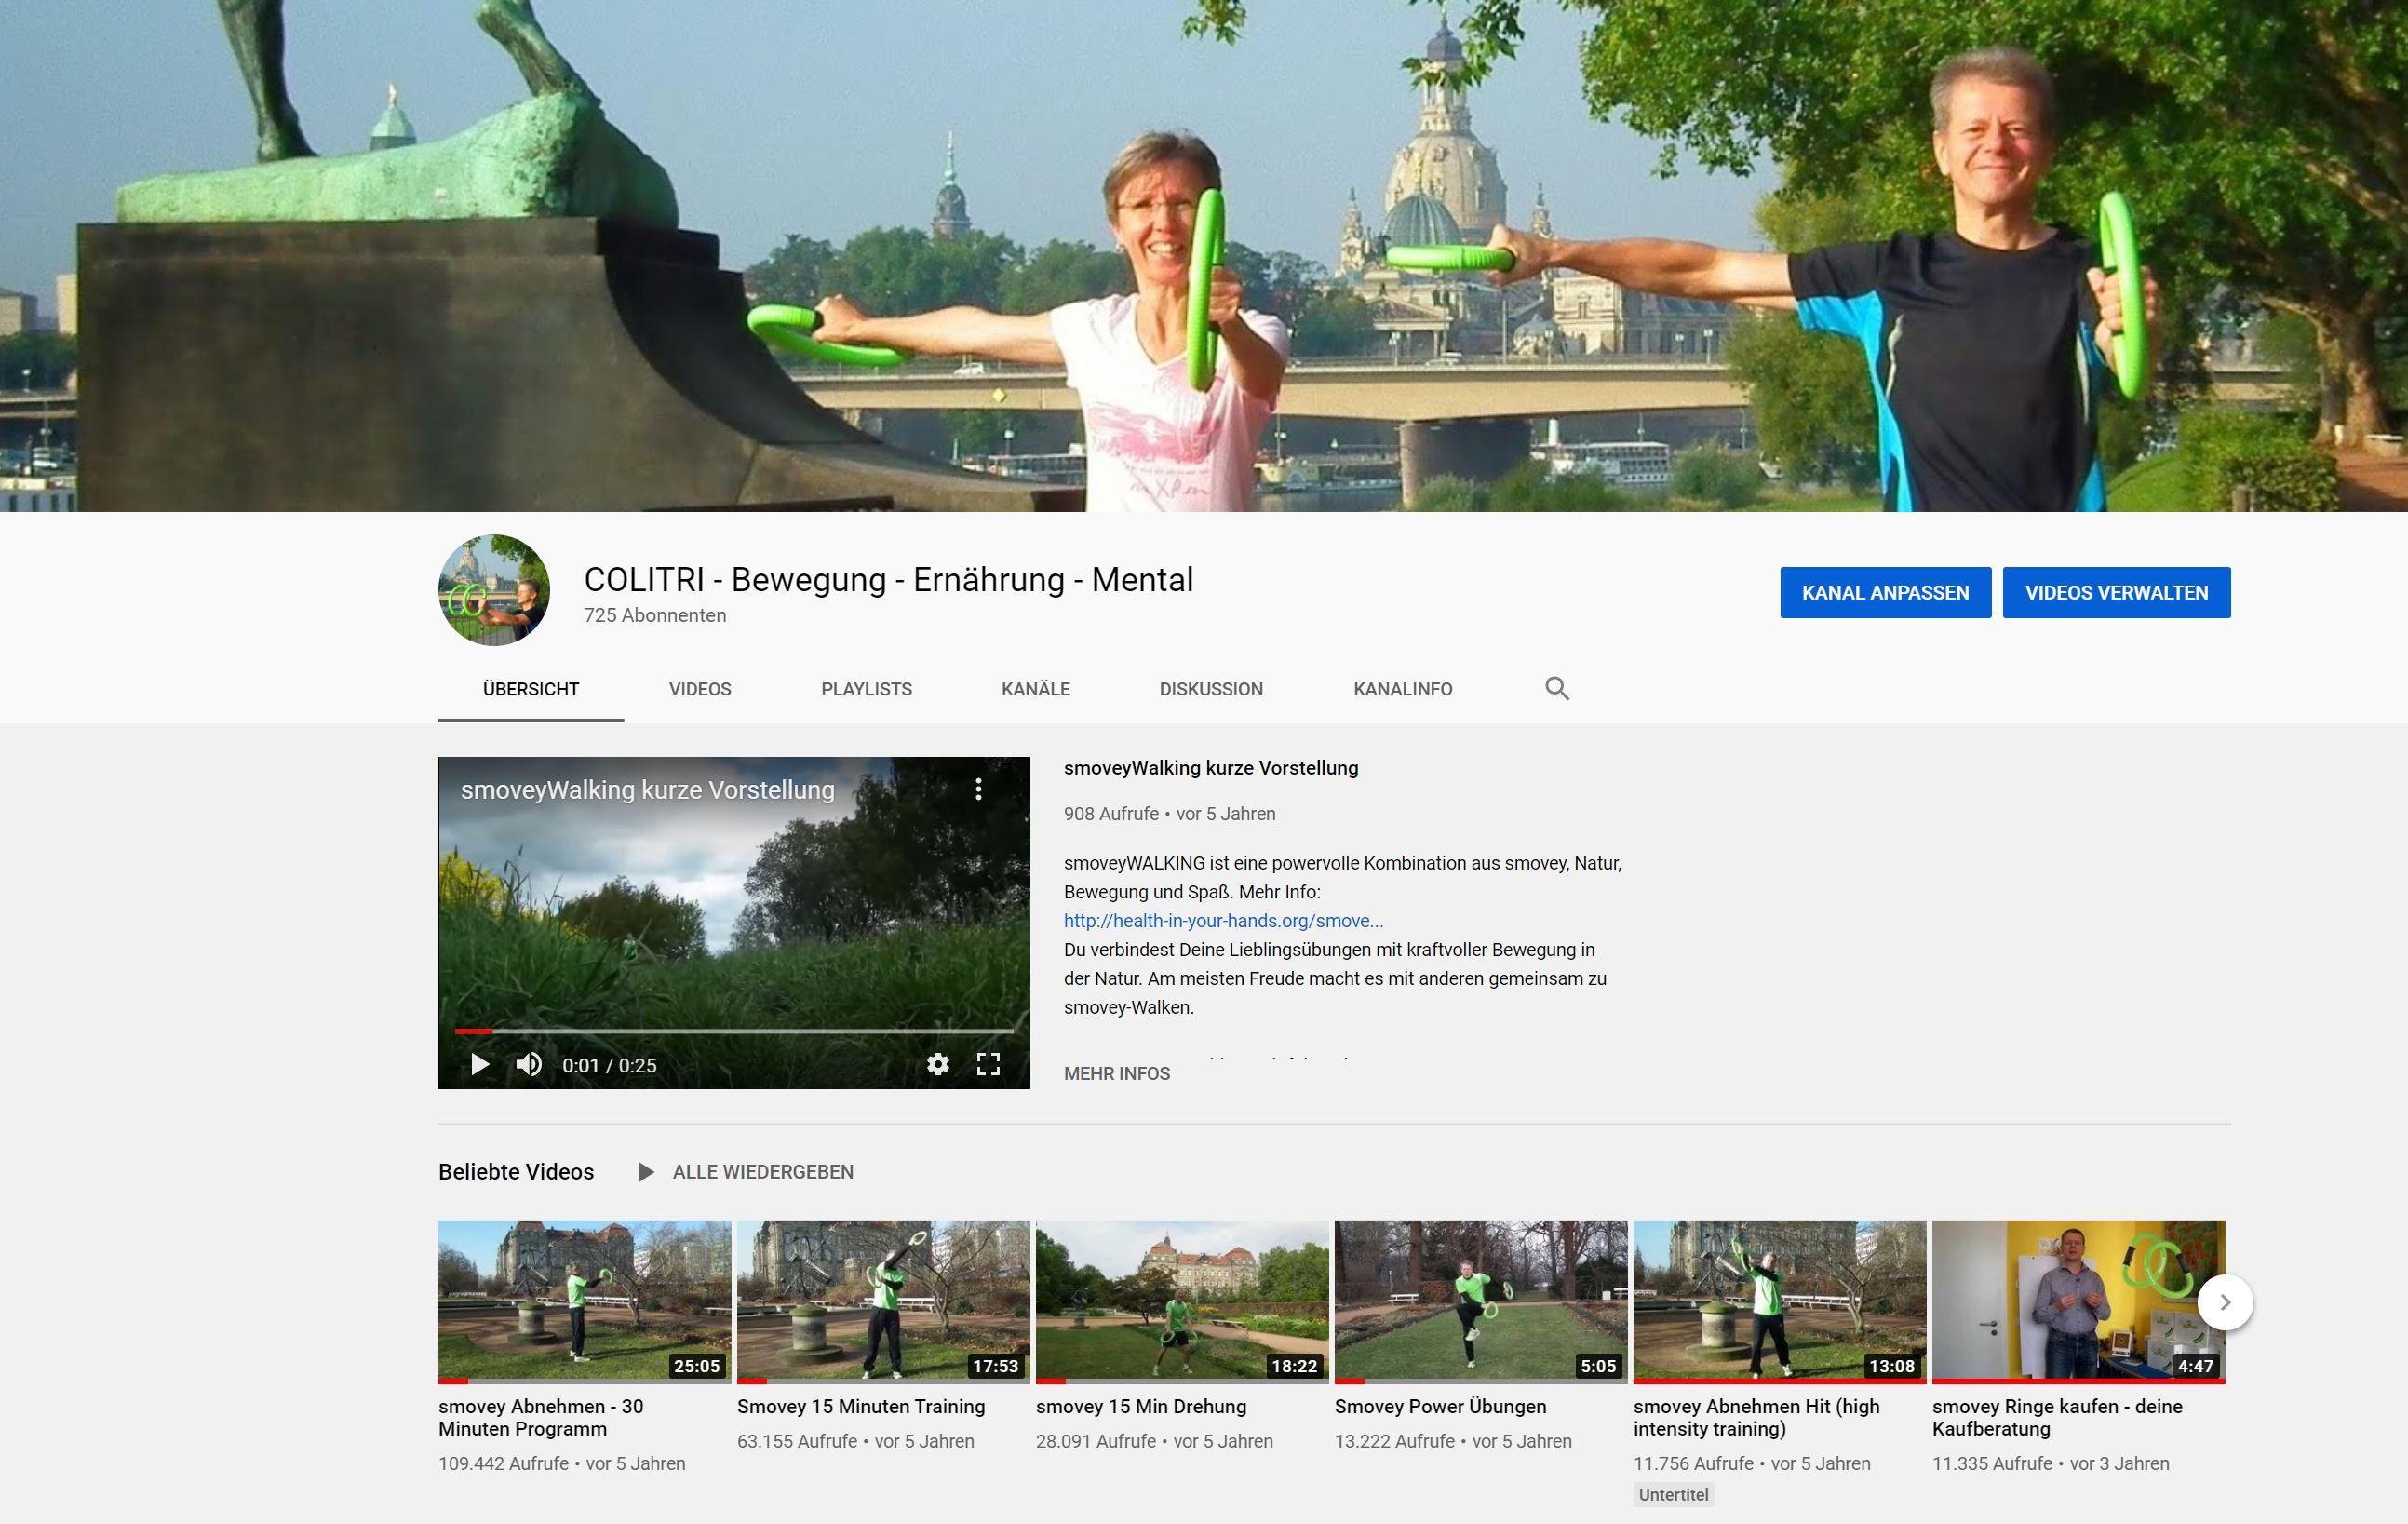 Youtube-Kanal smovey Dresden